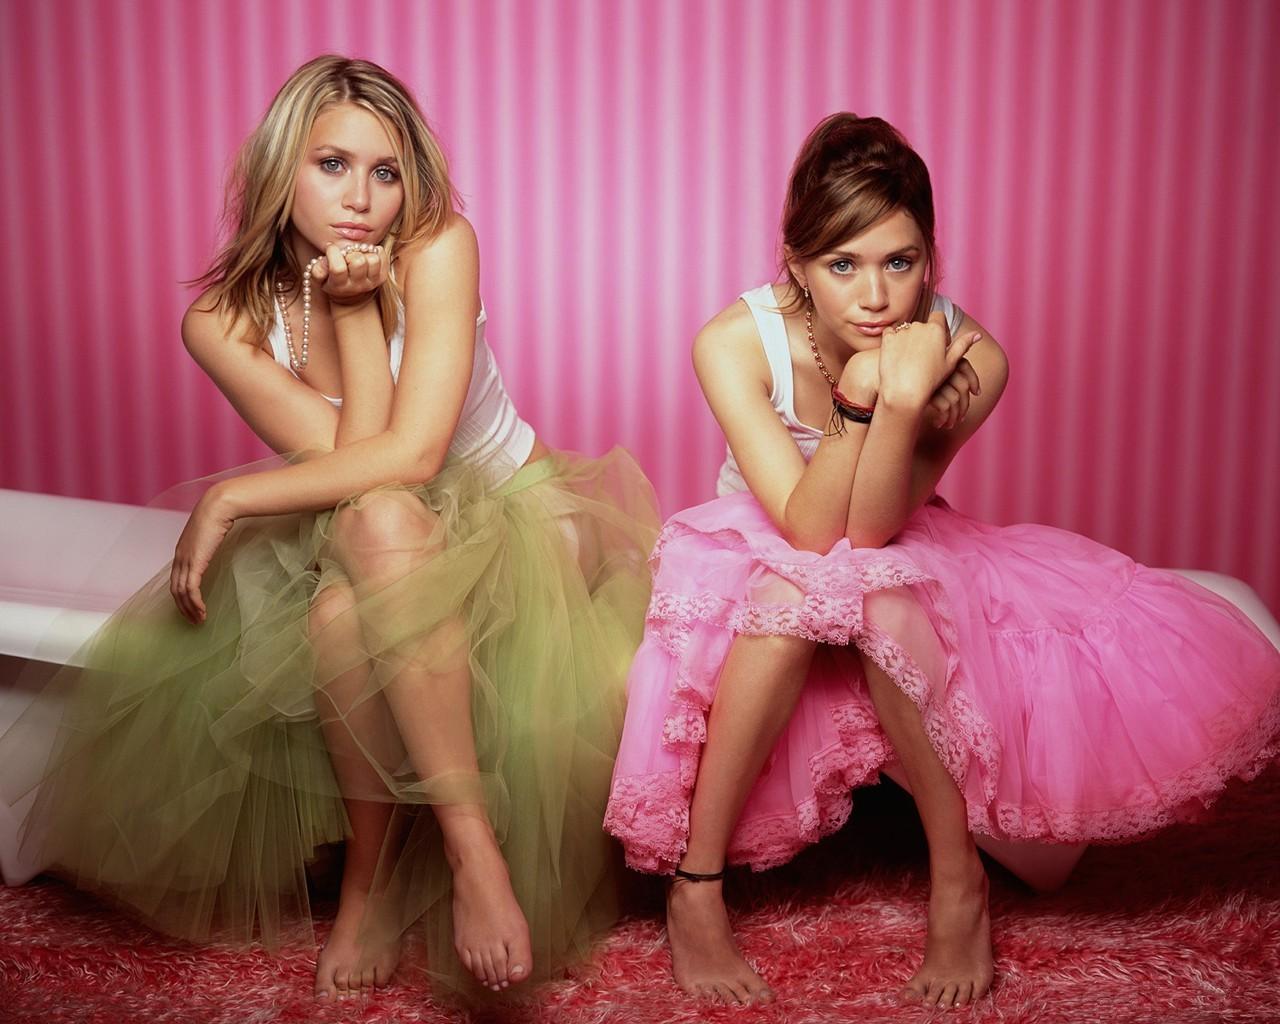 http://1.bp.blogspot.com/_RbzRGgOKLTM/TK9wUX_BcZI/AAAAAAAAAOc/ku3L4xrzJFE/s1600/Mary_-_Kate_and_Ashley_Olsen.jpg